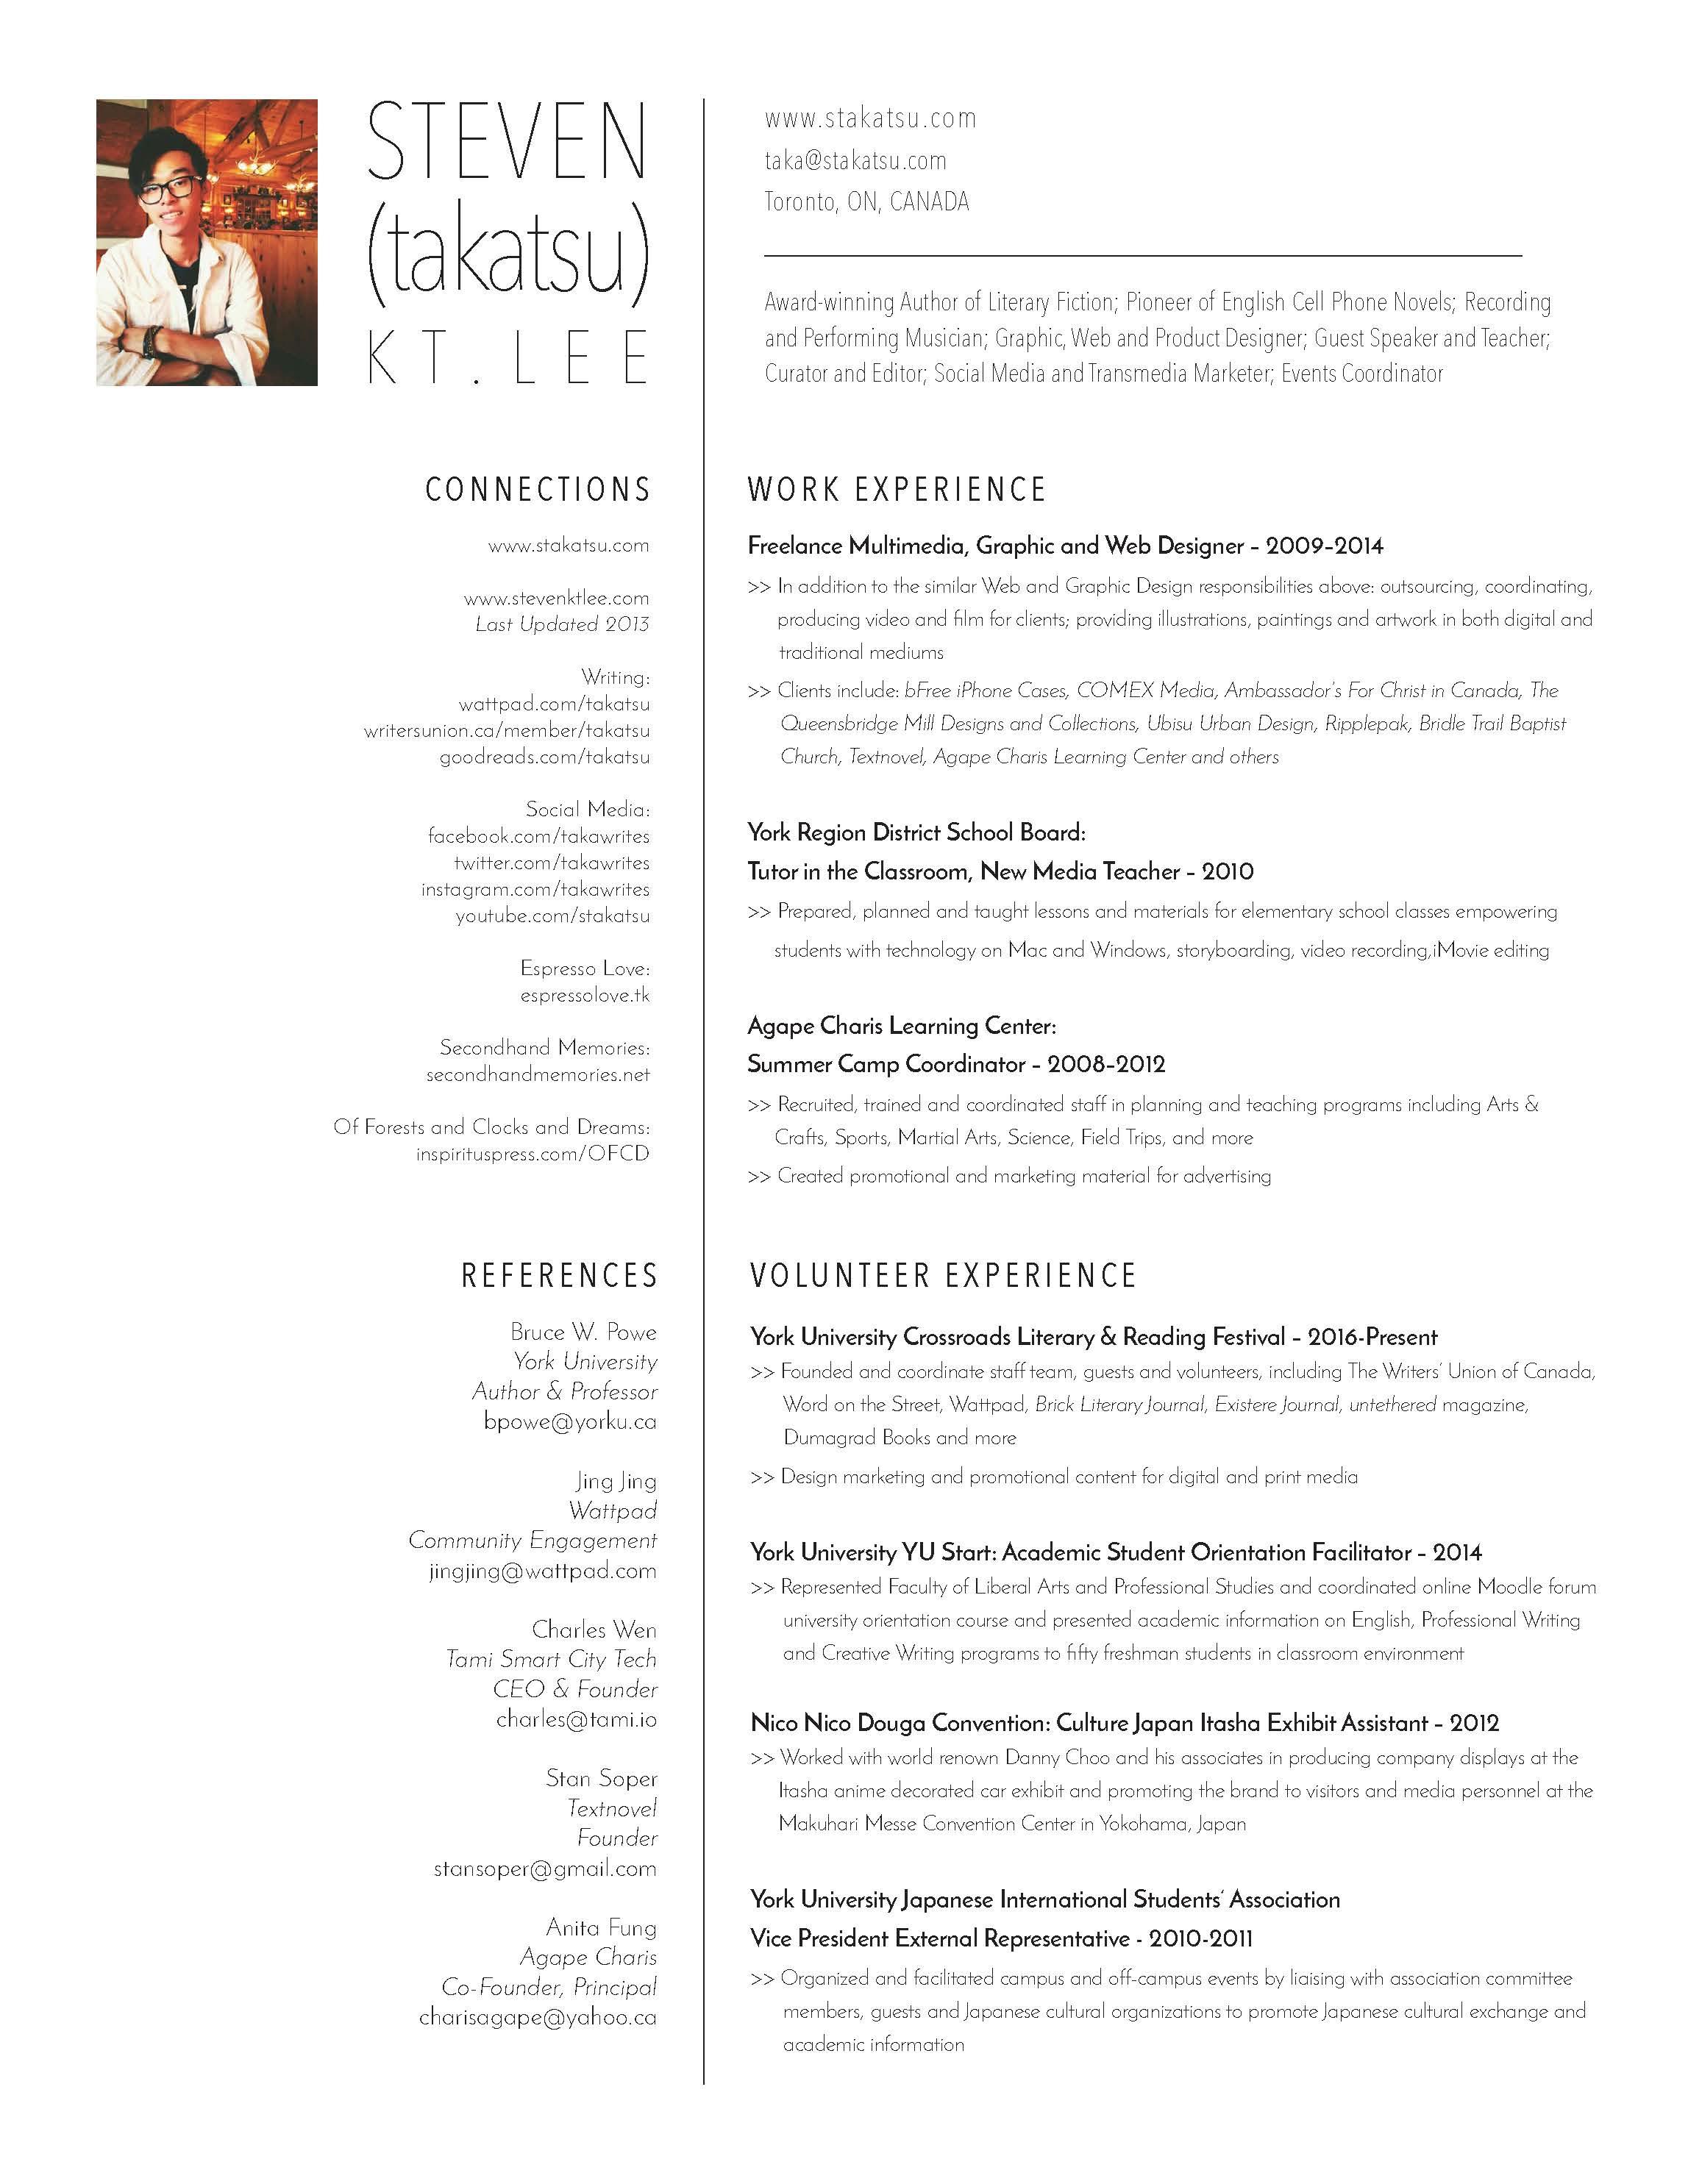 curator cover letter - Emayti australianuniversities co